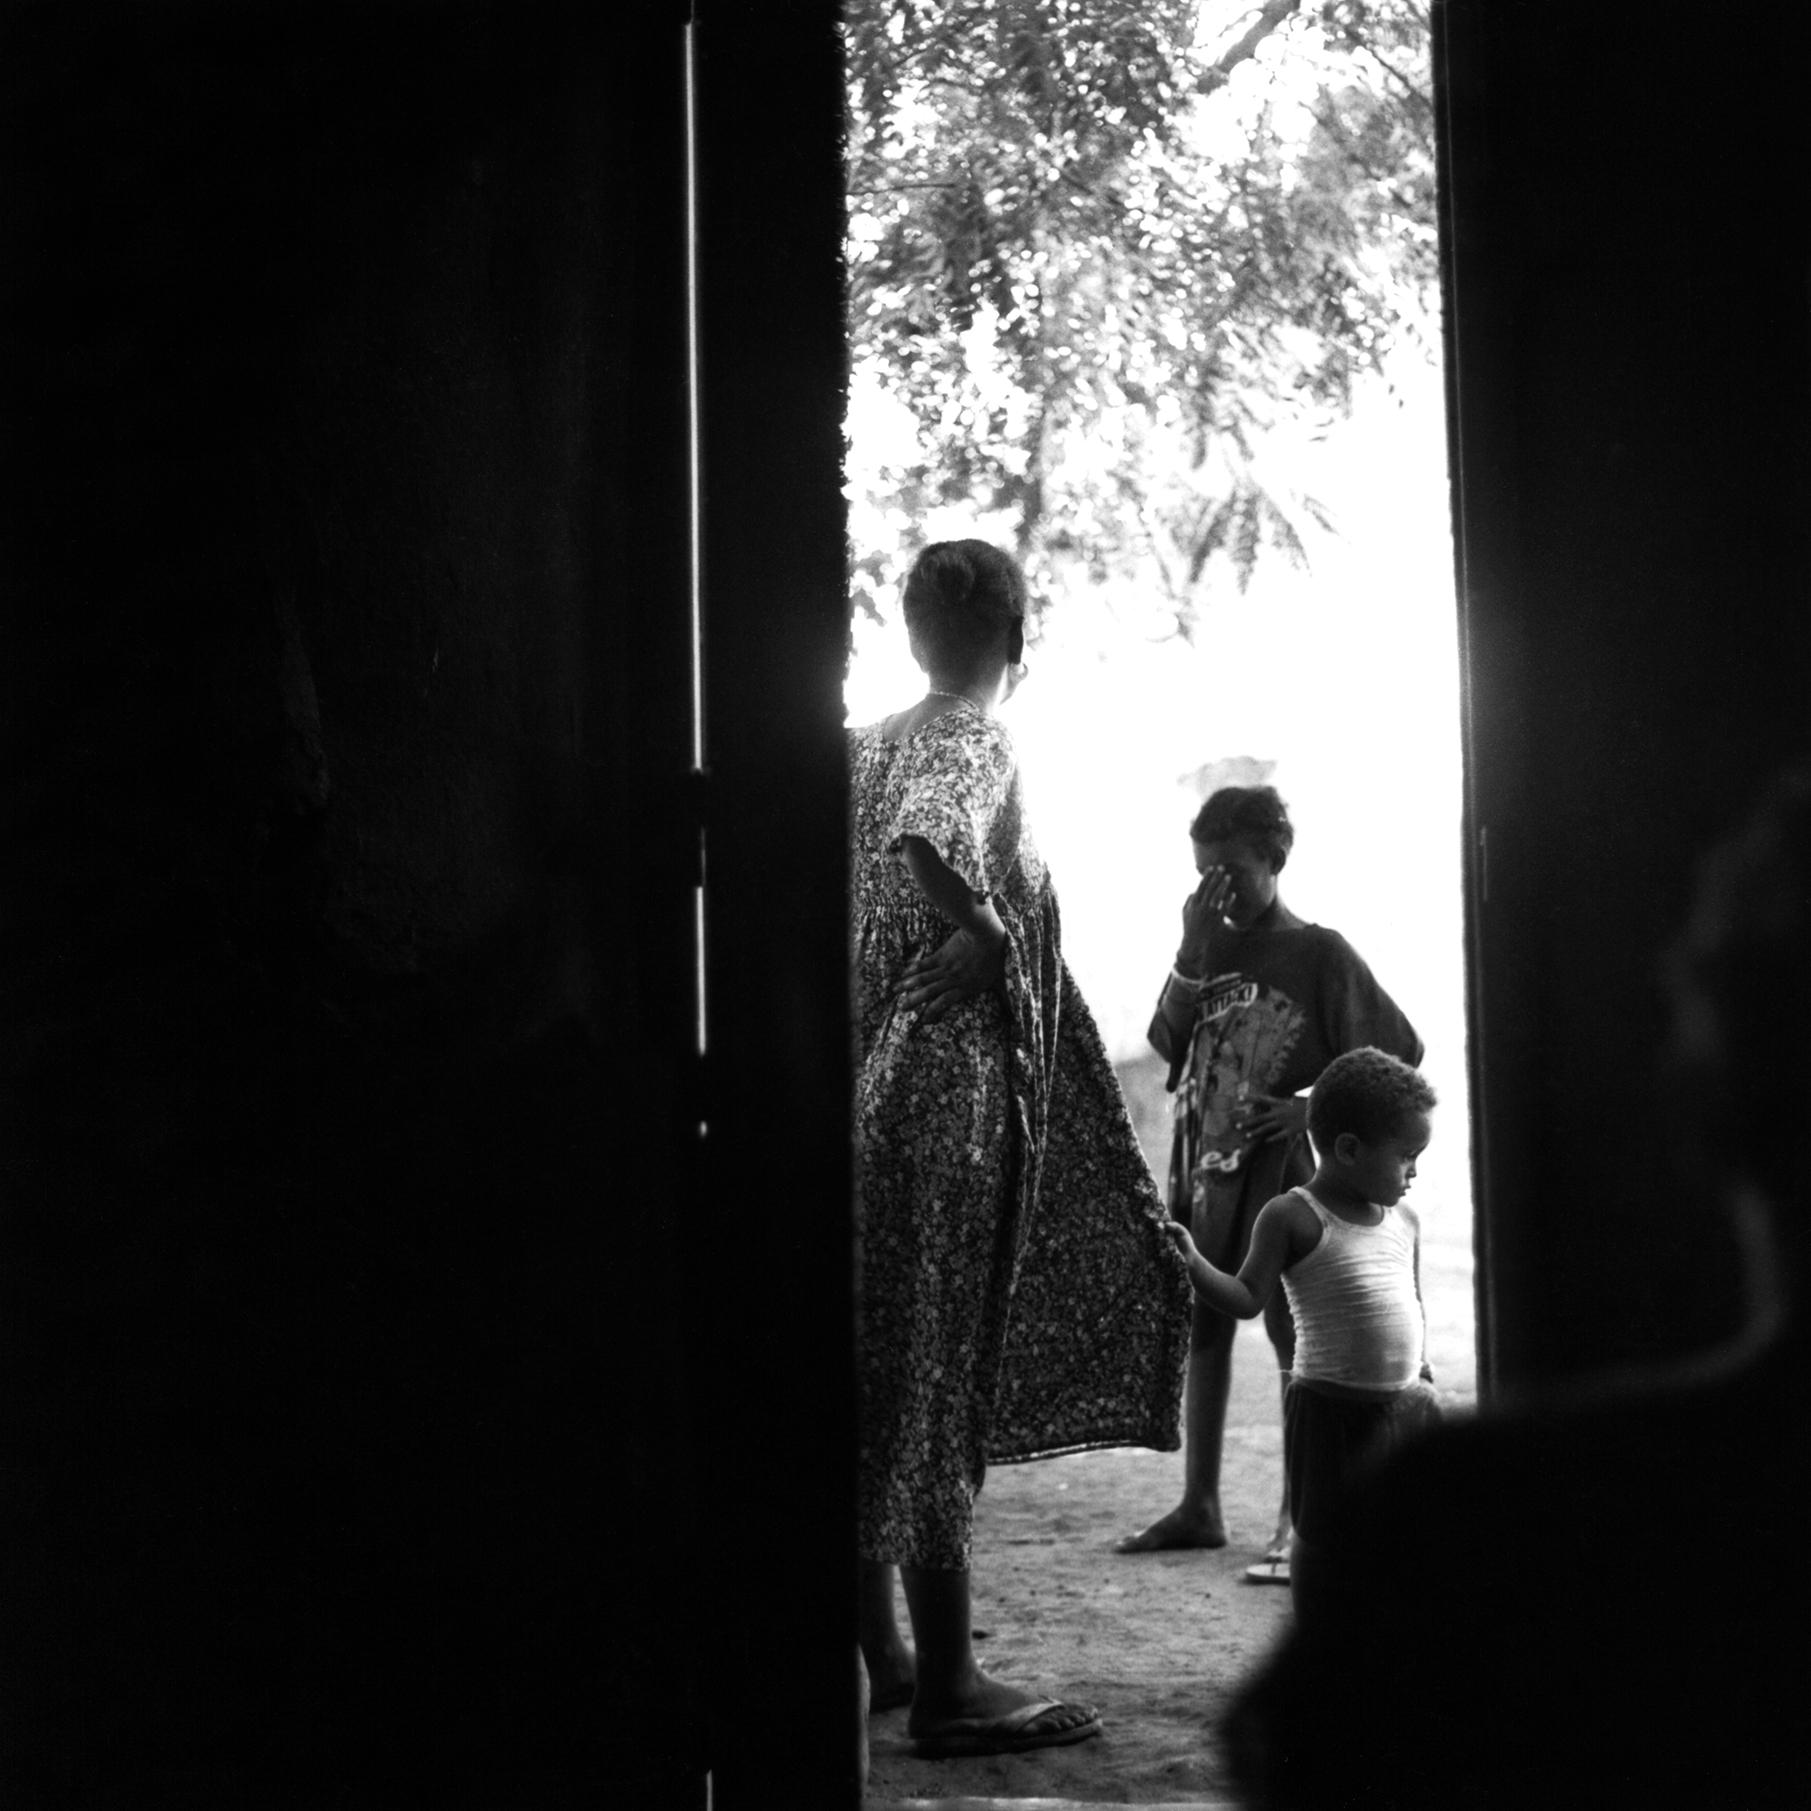 02-03Ethiopie01.jpg